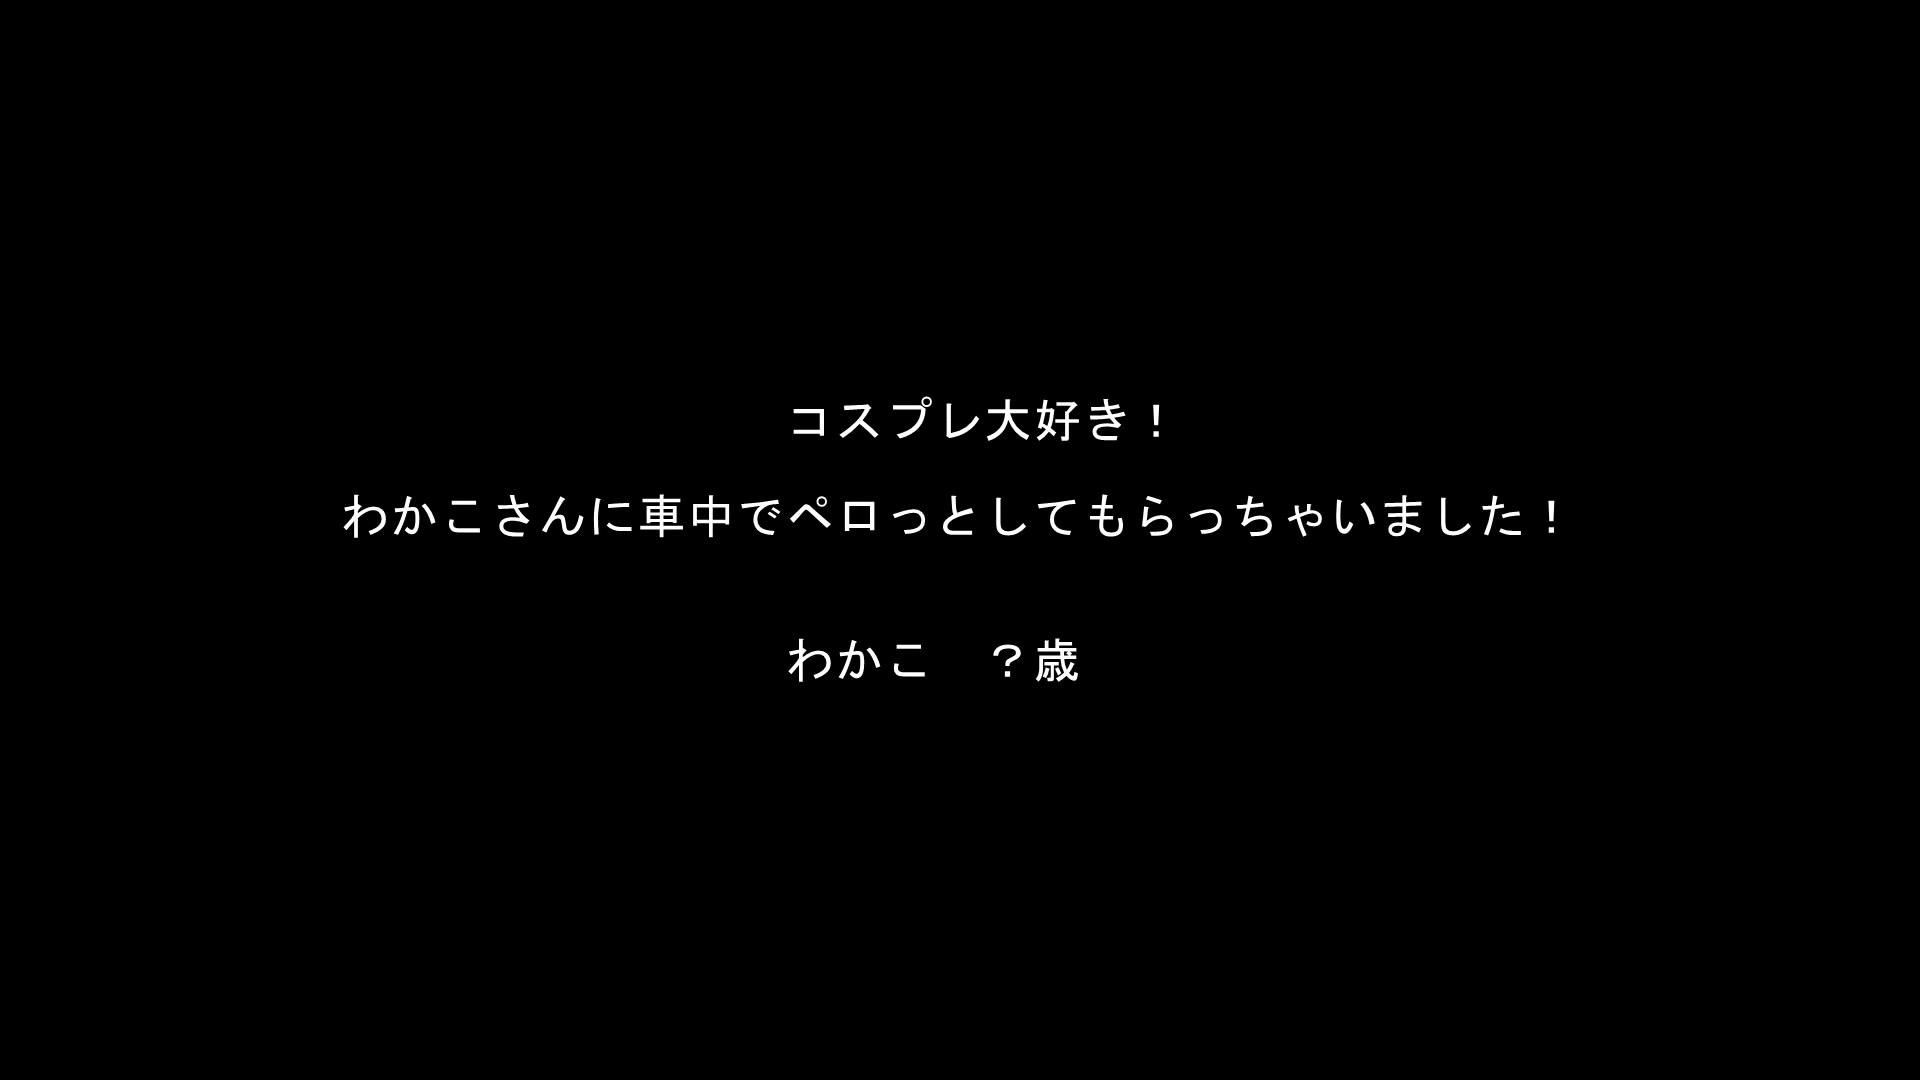 FC2 PPV 990010 ☆お買い得・再販☆ コスプレ大好き!わかこさんシリーズ!【高画質ZIP付】